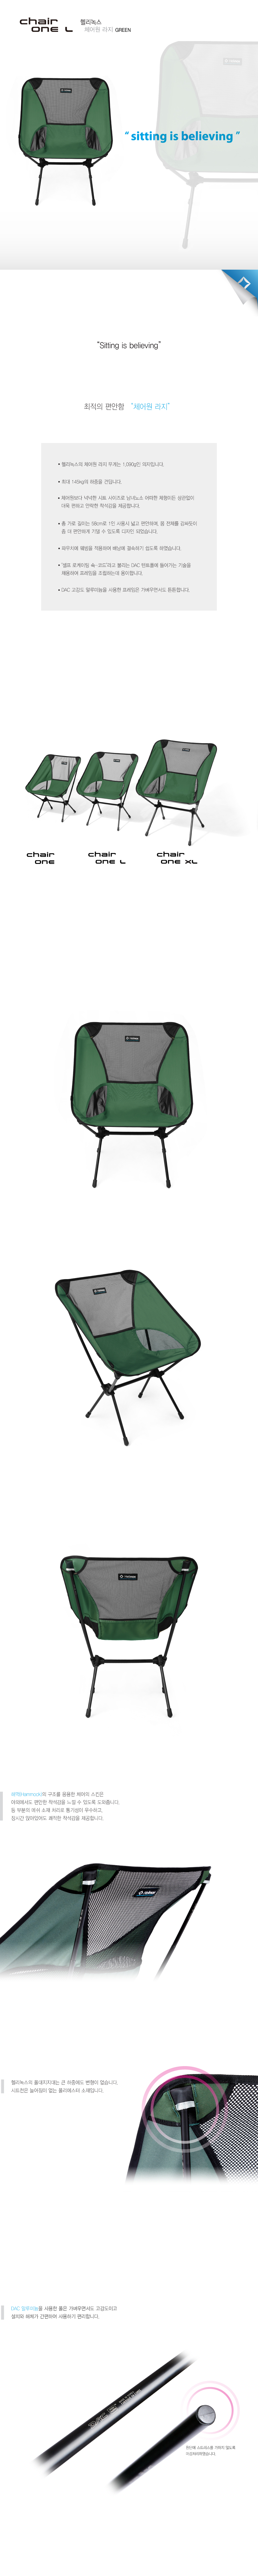 20180122-Helinox_chair-one_-L-GREEN-상품페이지.jpg